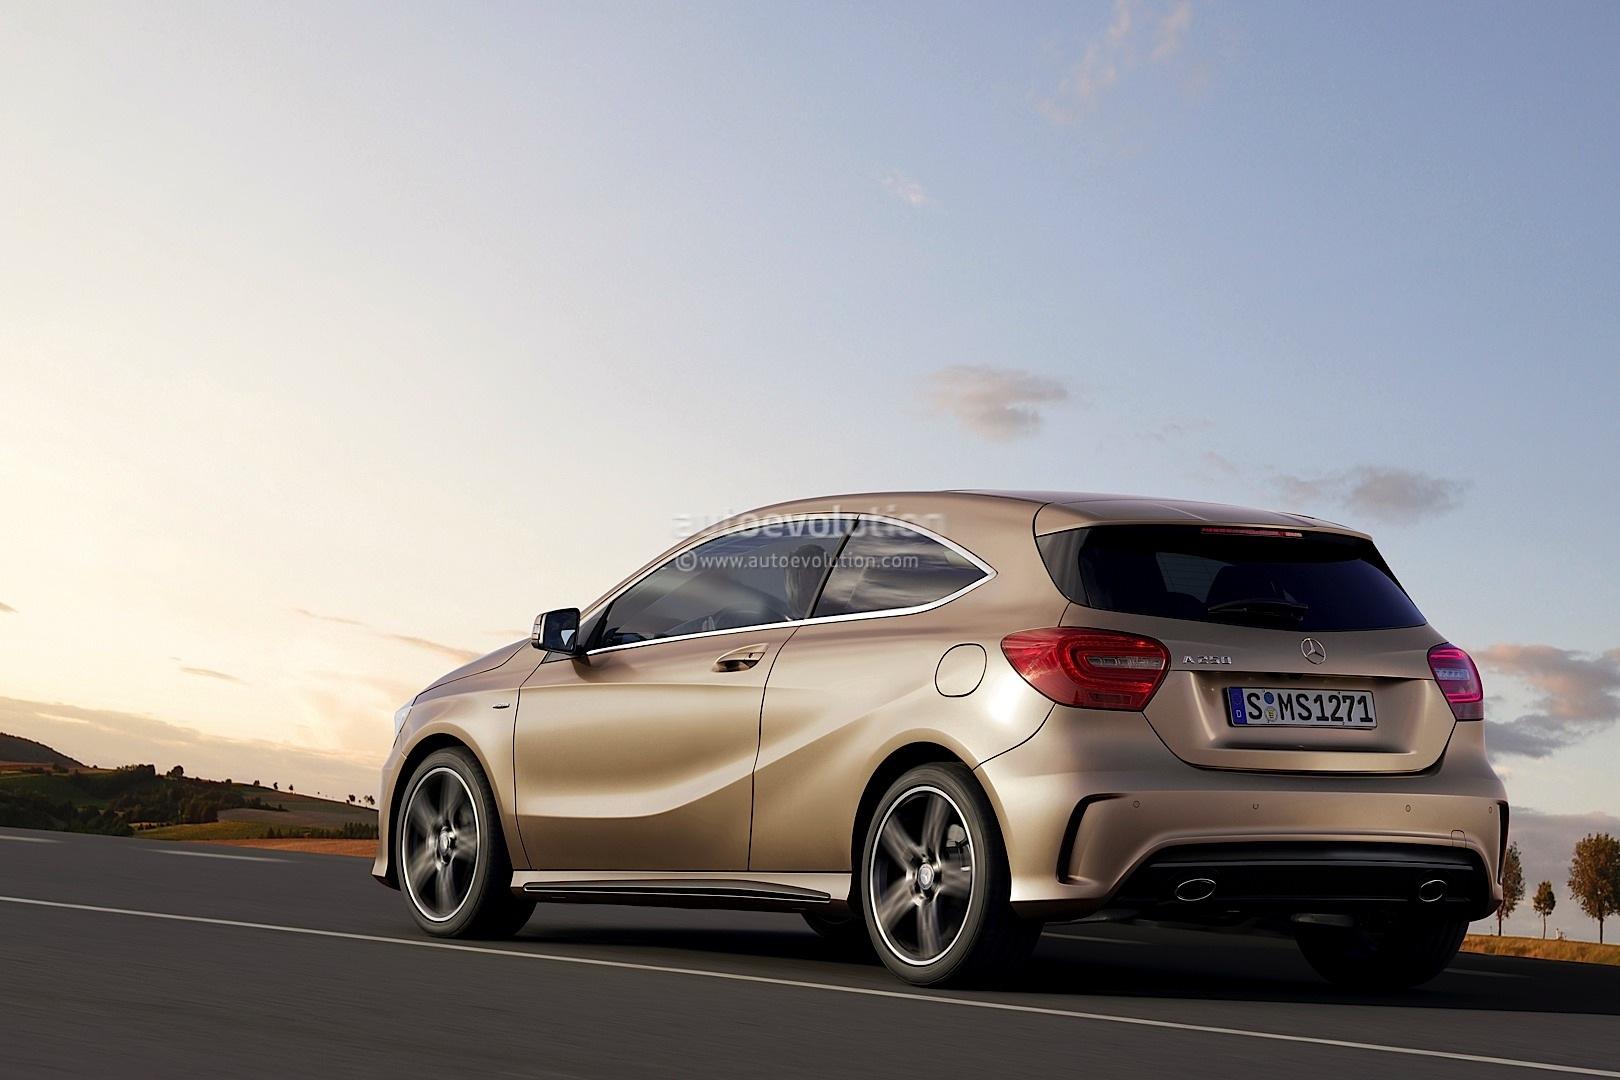 [Rumeurs]  Les futures Mercedes Classe A  (W176) - Page 3 W176-2013-mercedes-a-class-3-door-rendering-51521_1